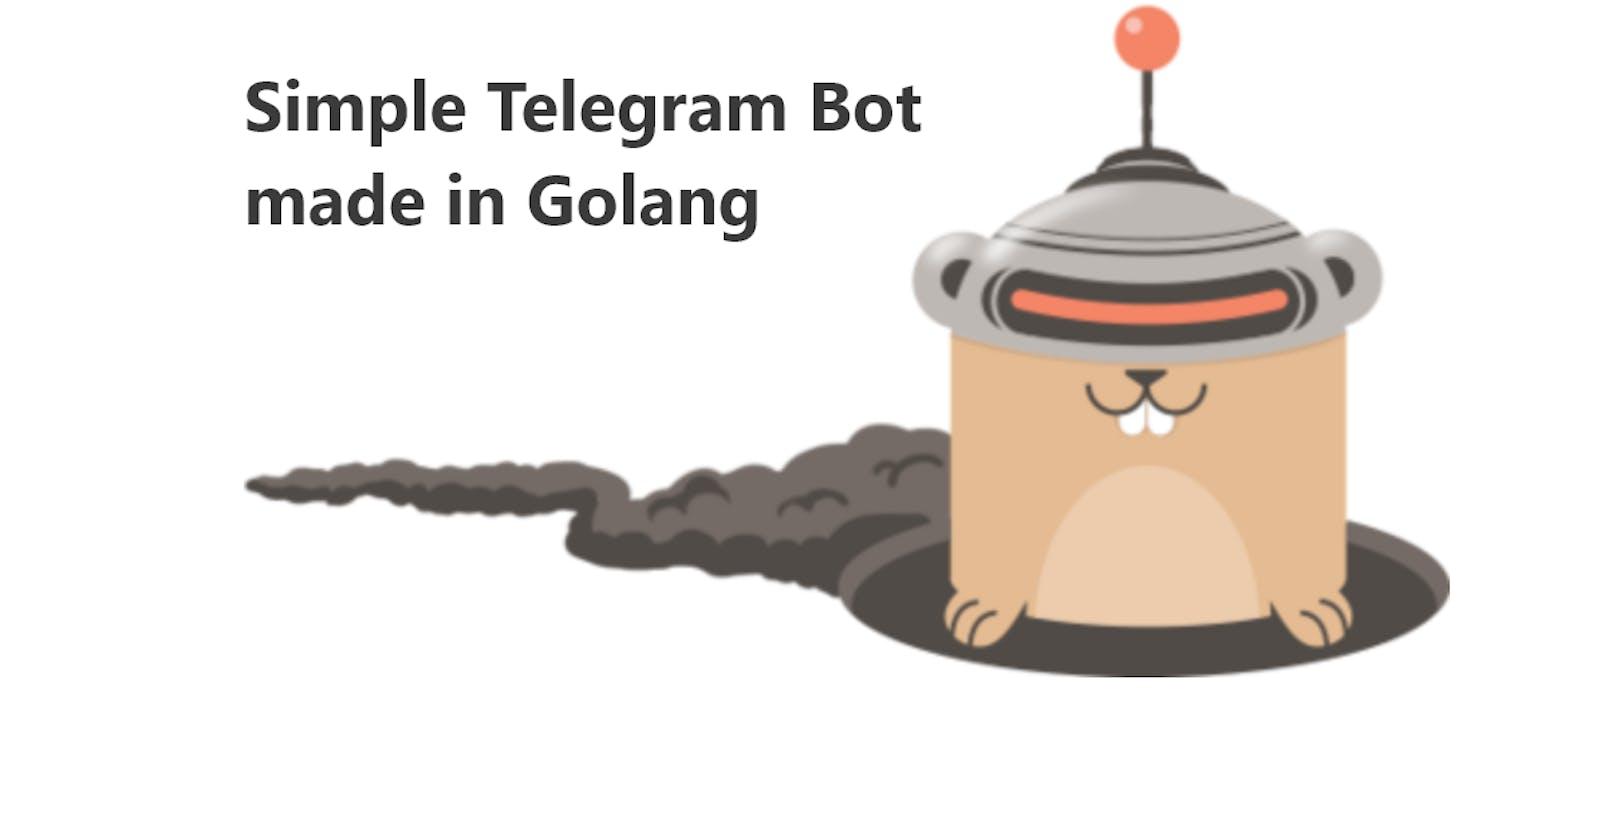 Make a Compliment Telegram Bot in Golang